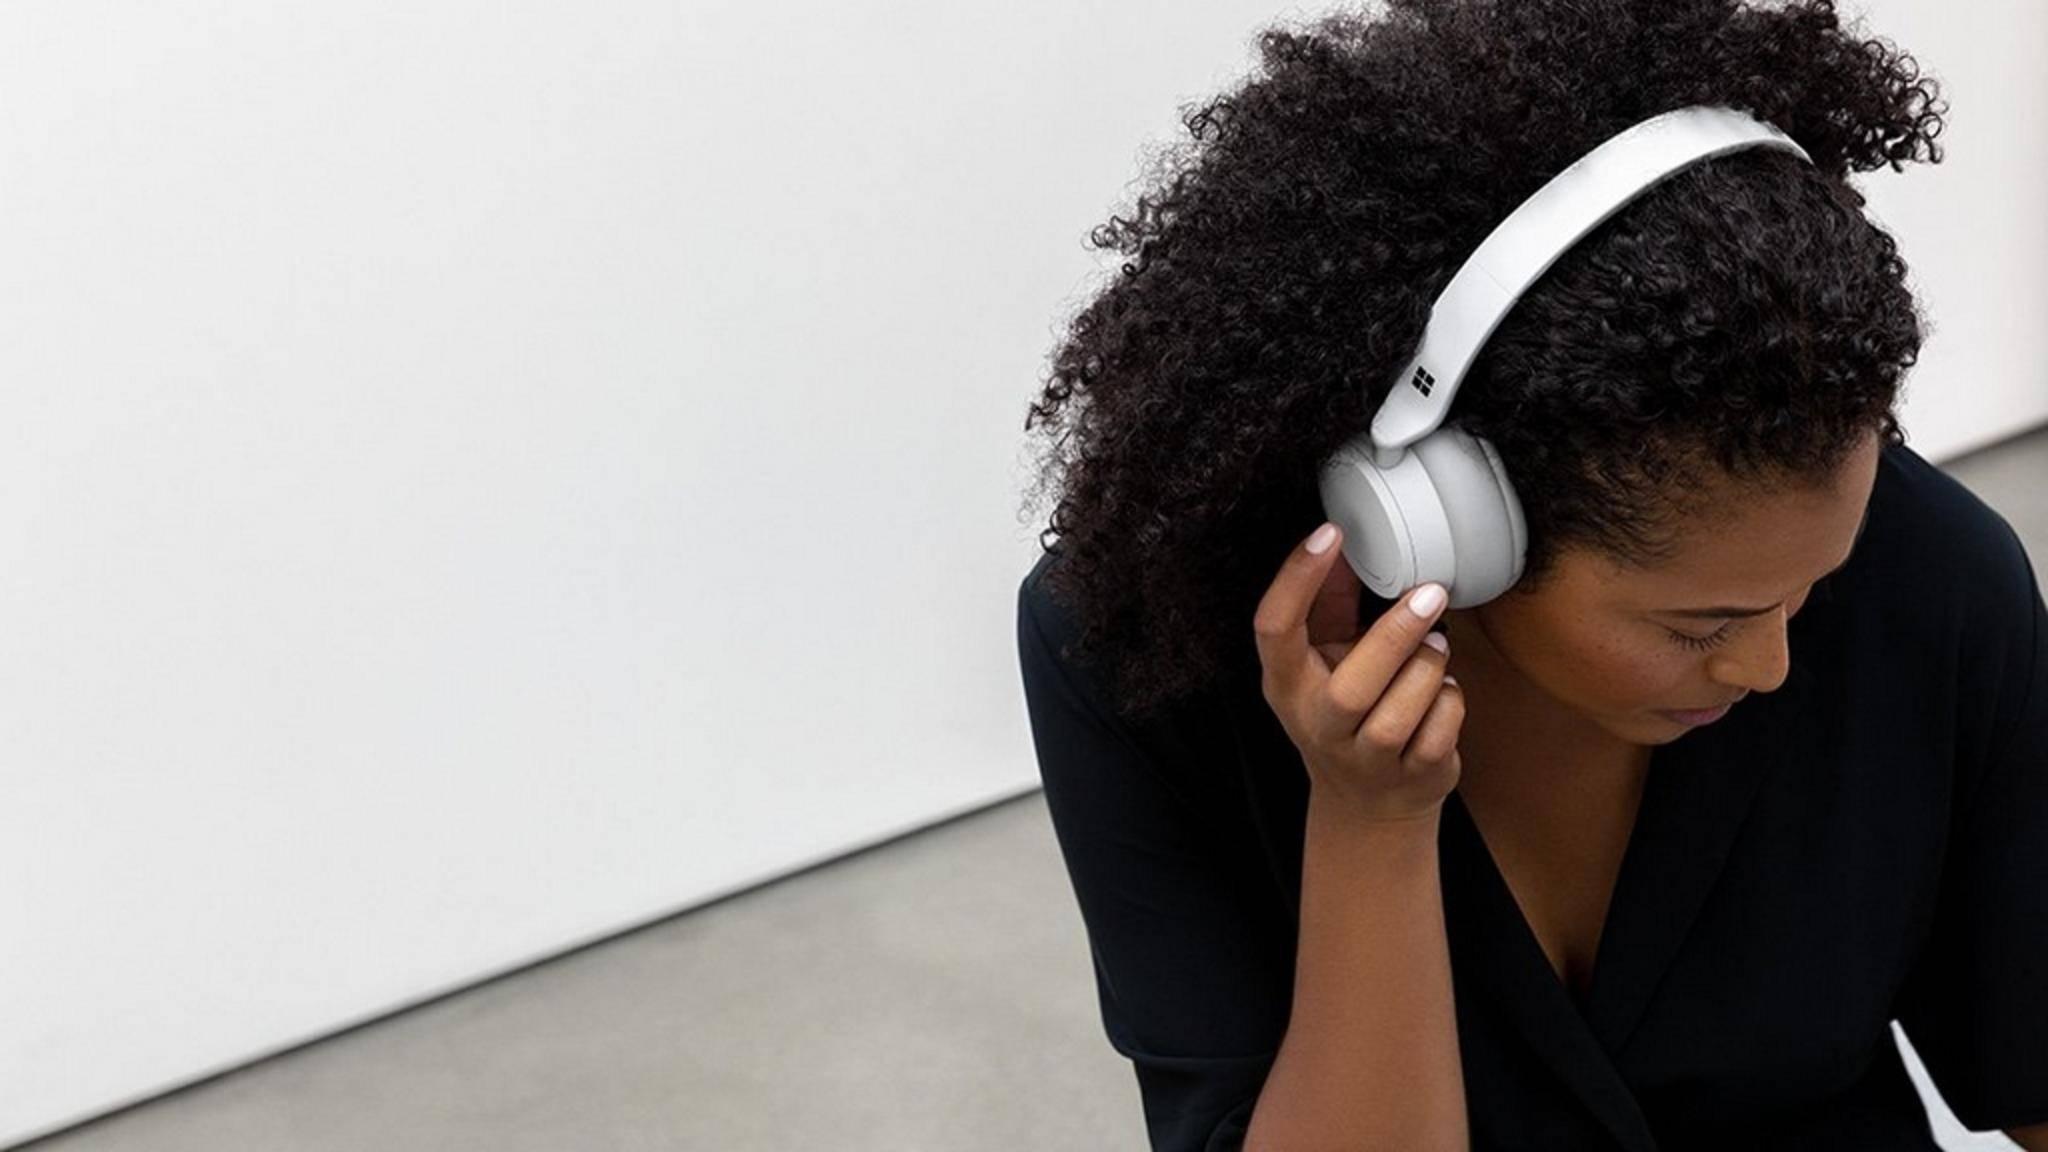 Mit den Surface Headphones greift Microsoft Bose und Co. an.